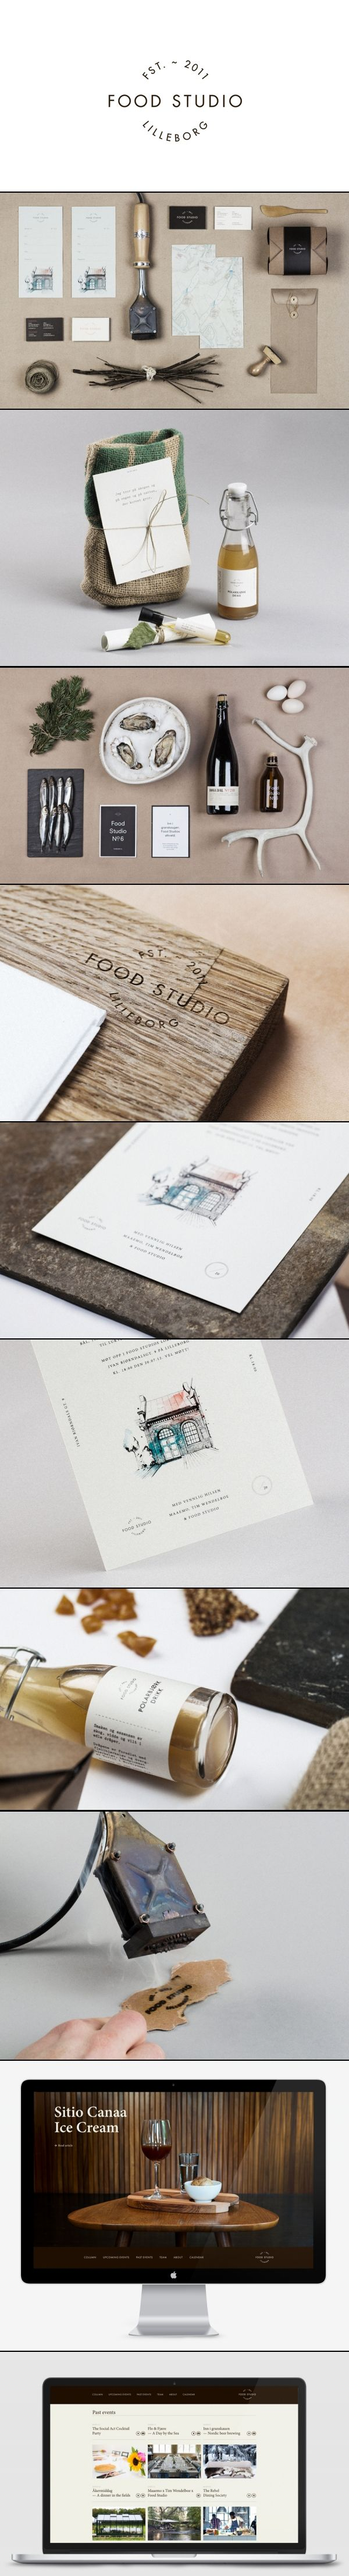 Food studio Design agency Bielke+Yang #identity #packaging #branding PD